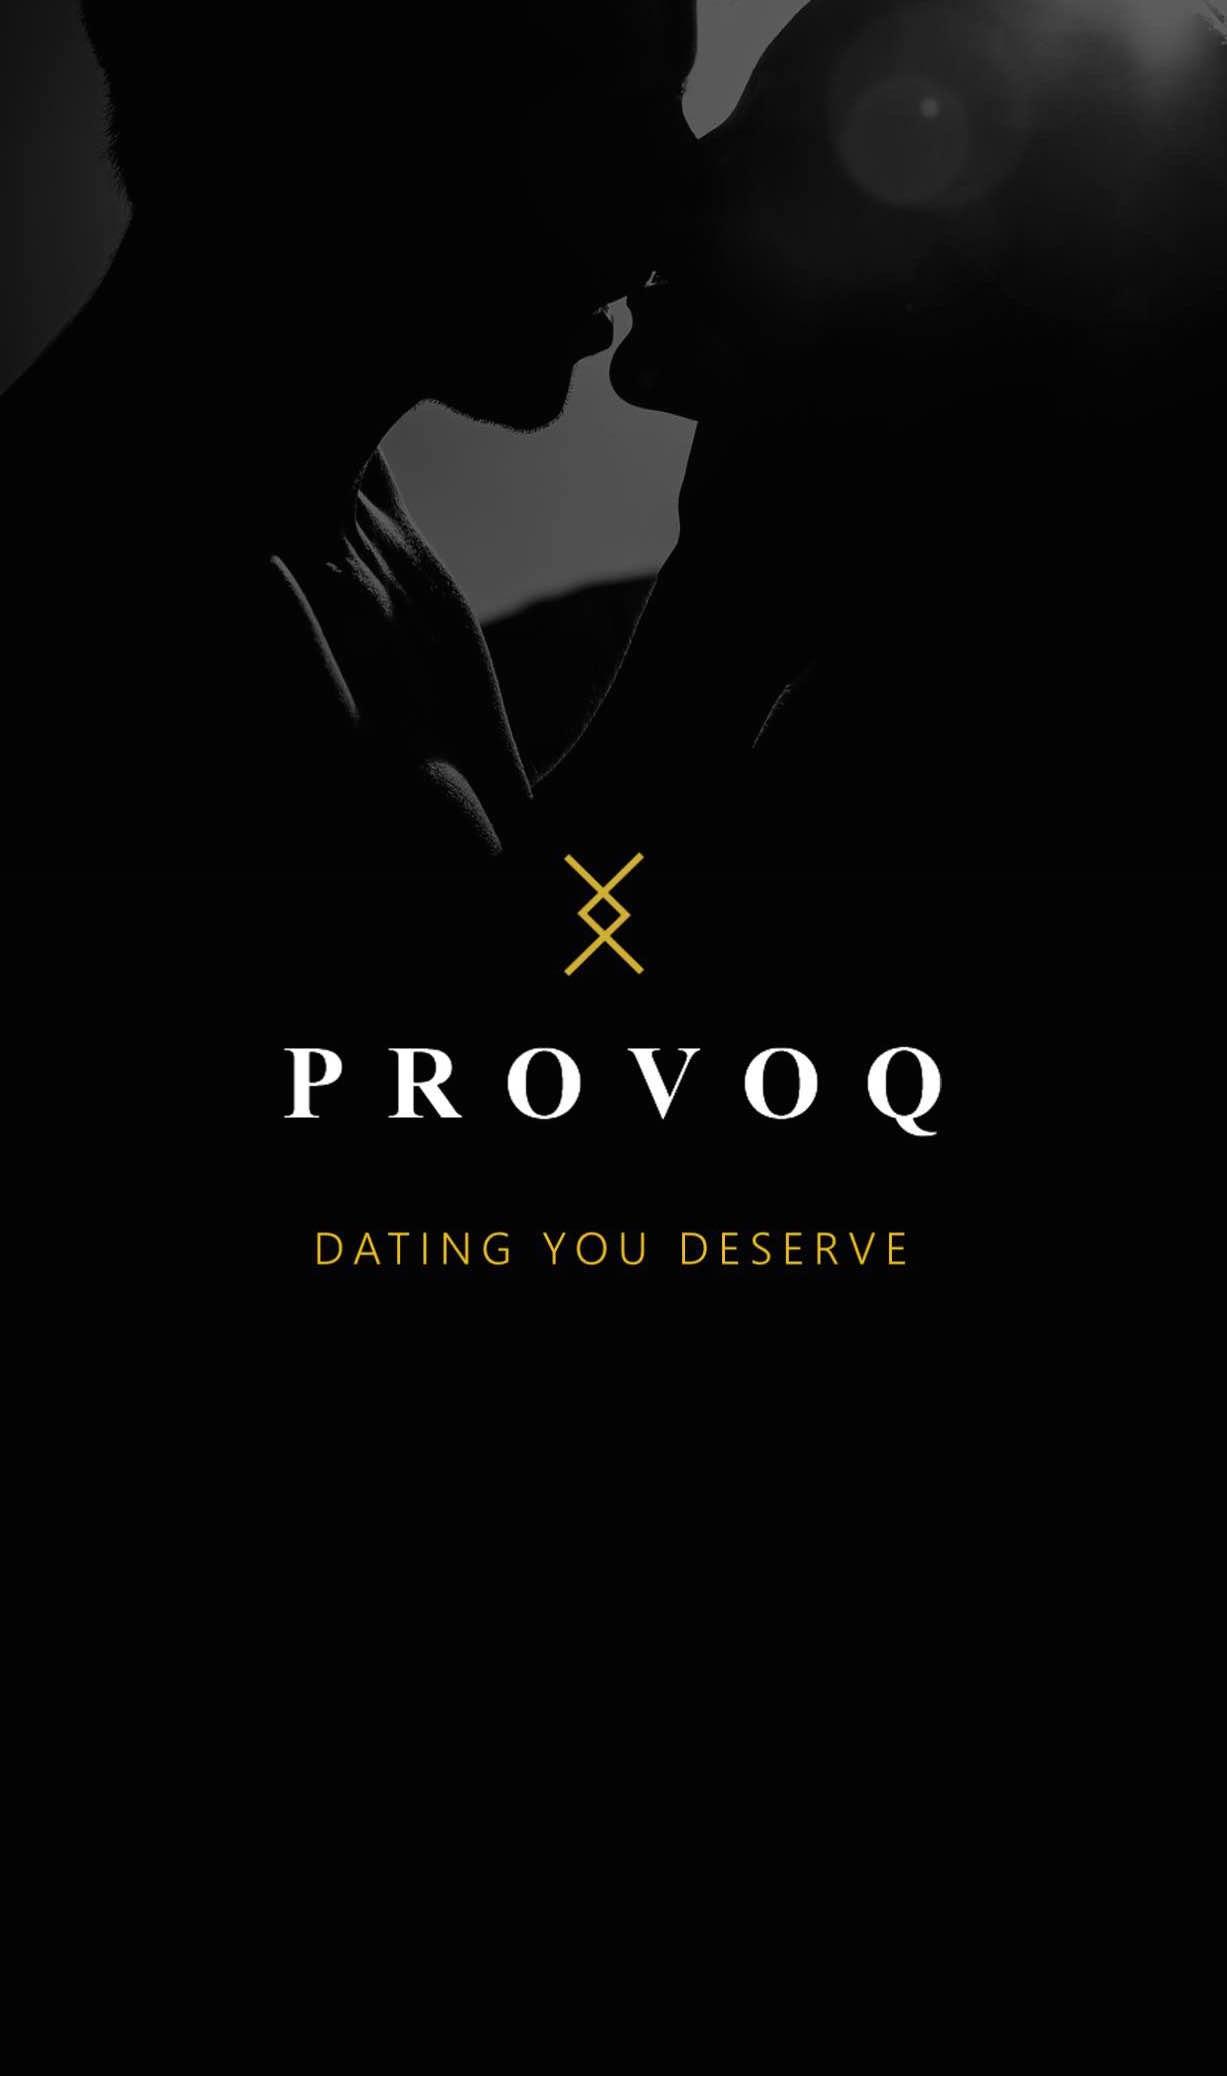 Provoq dating websites